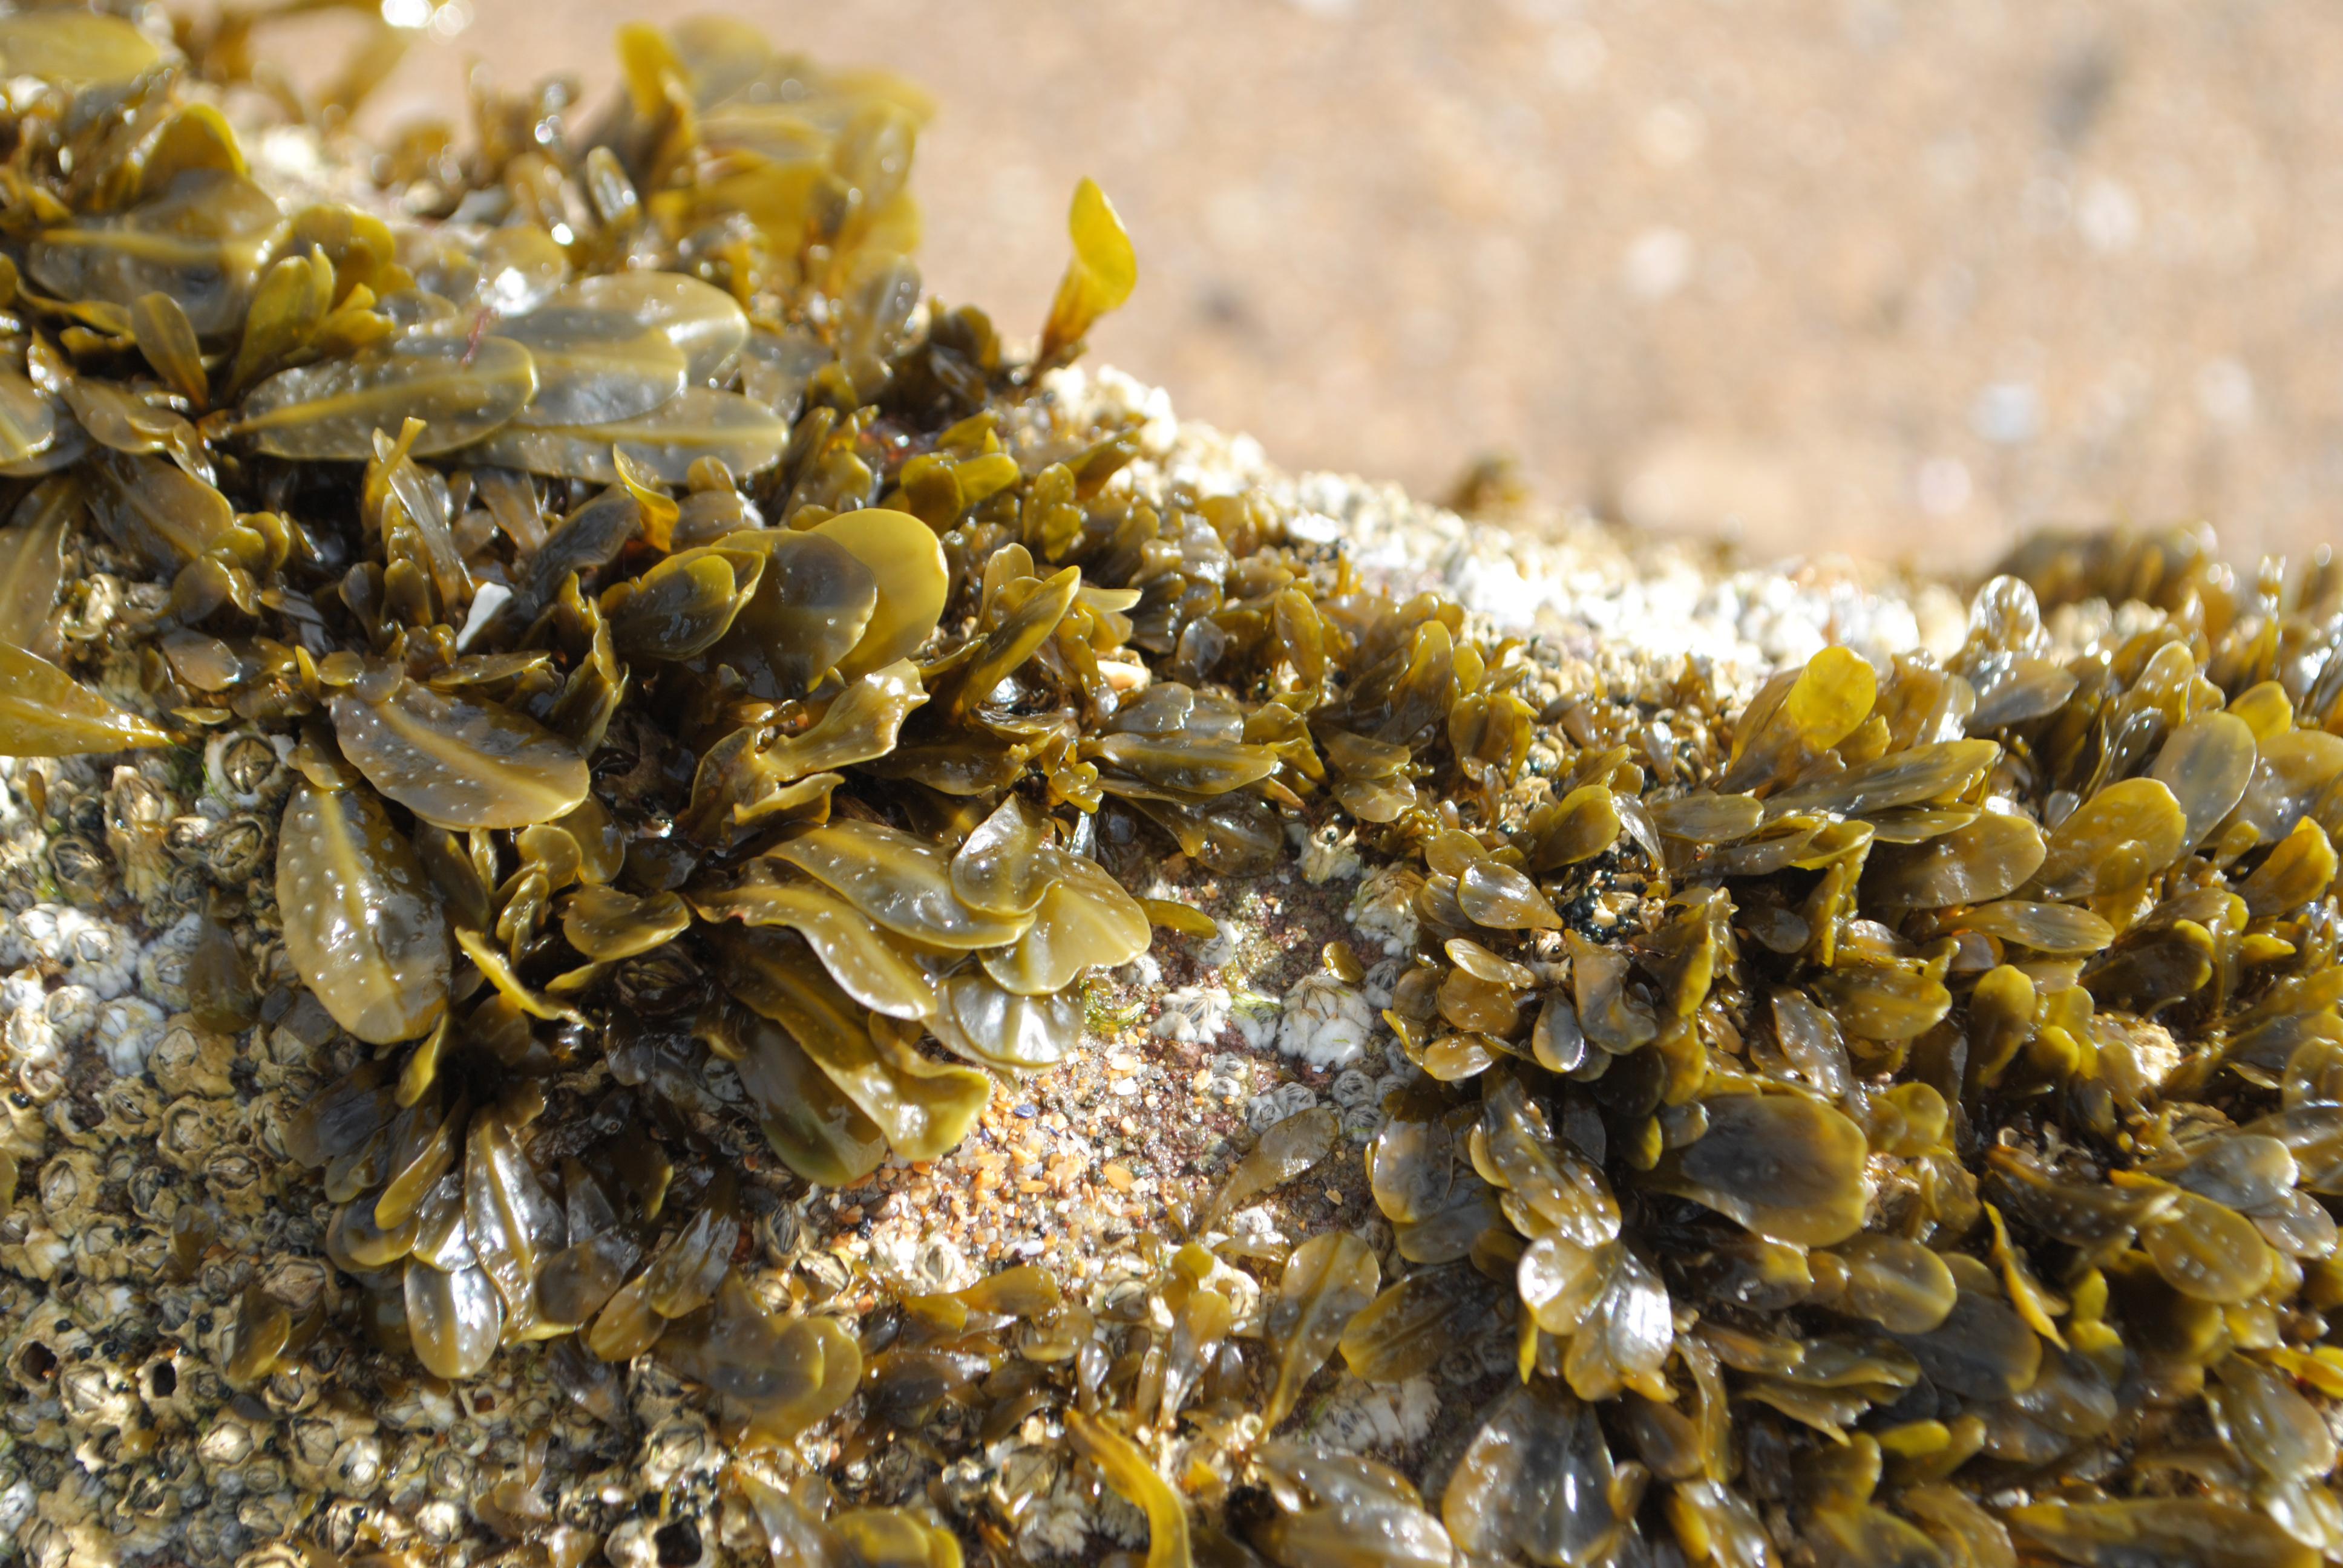 Baby seaweed and barnacles